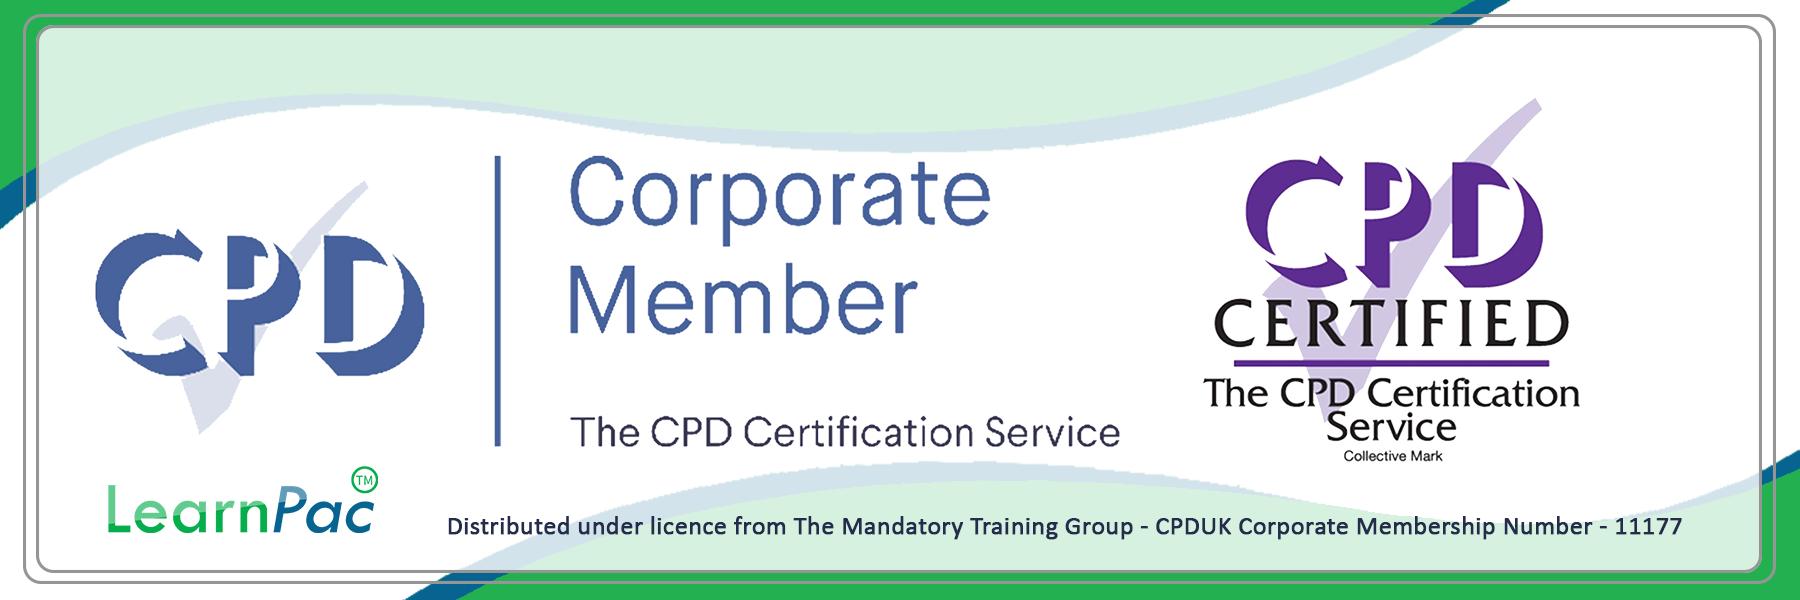 Care Certificate Standard 6 - CPDUK Certified - Learnpac System UK -